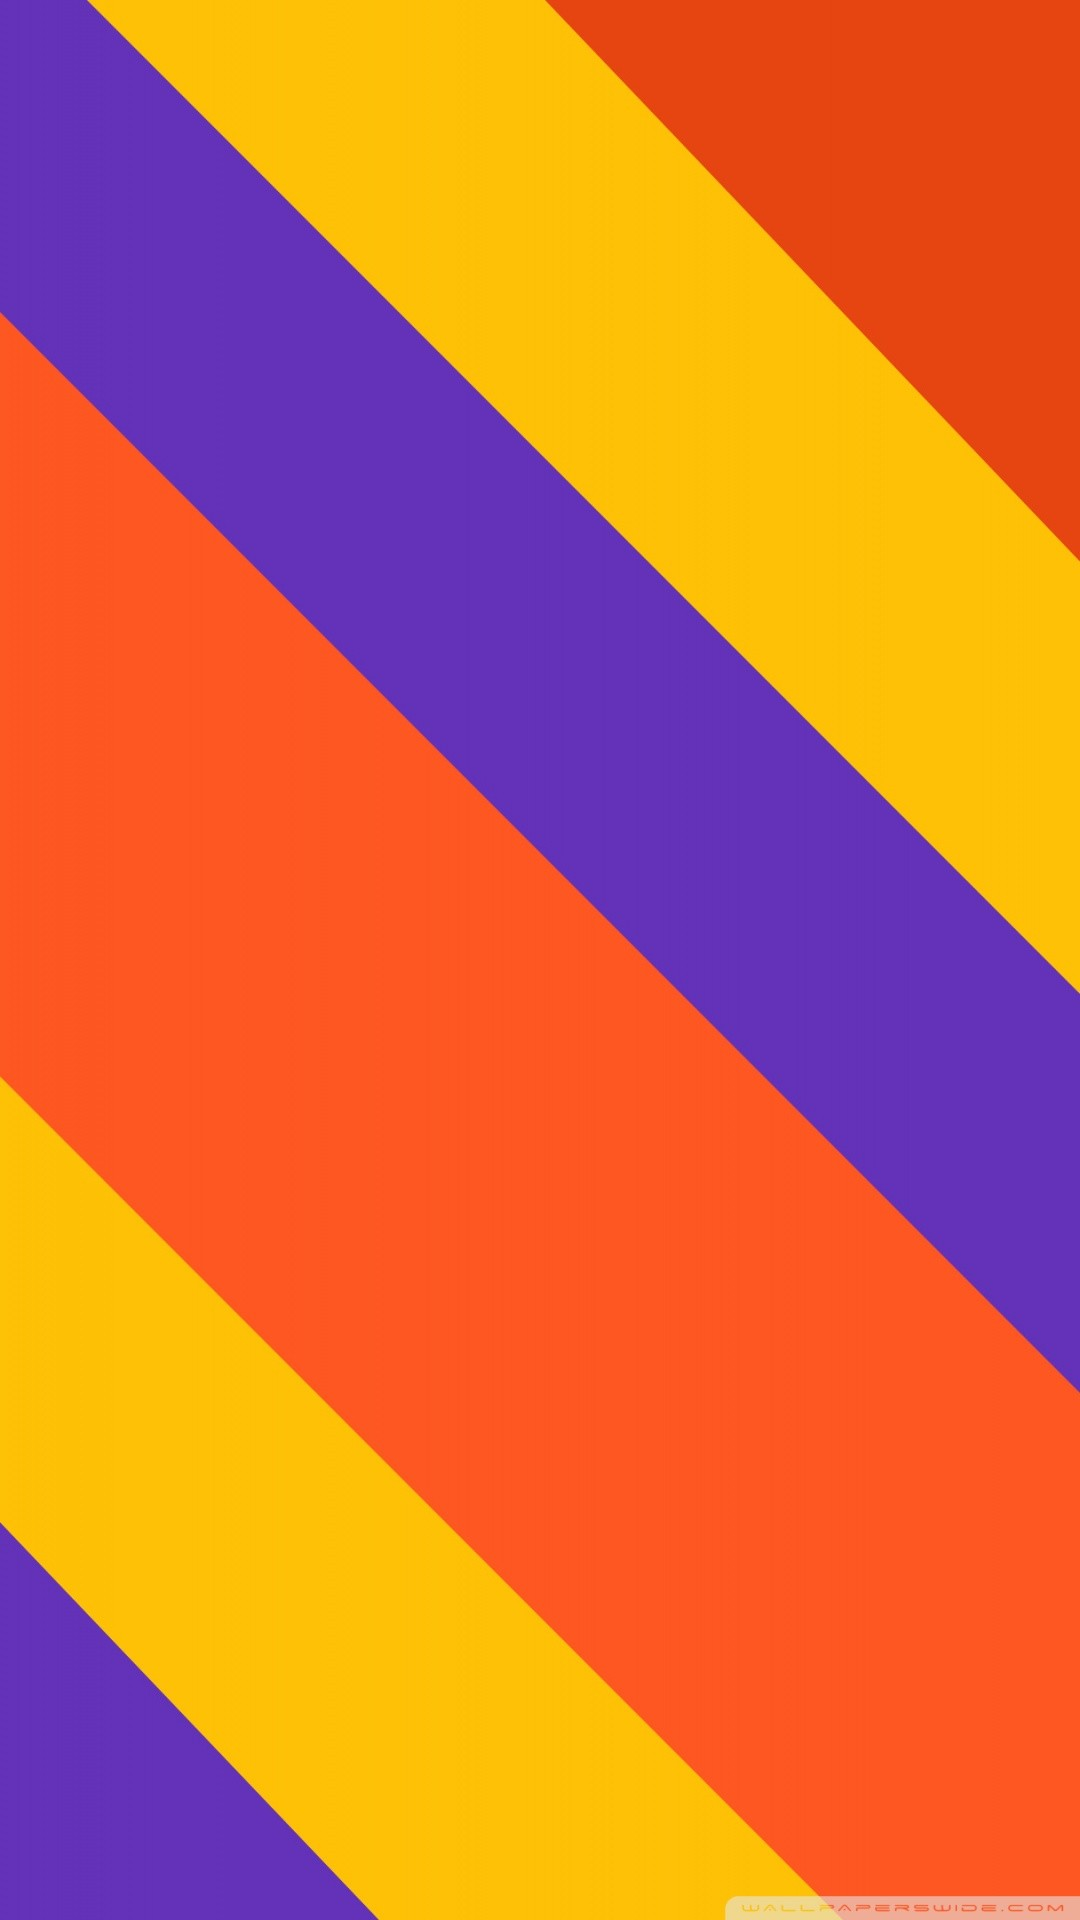 Free Material Design  phone wallpaper by shakertnt